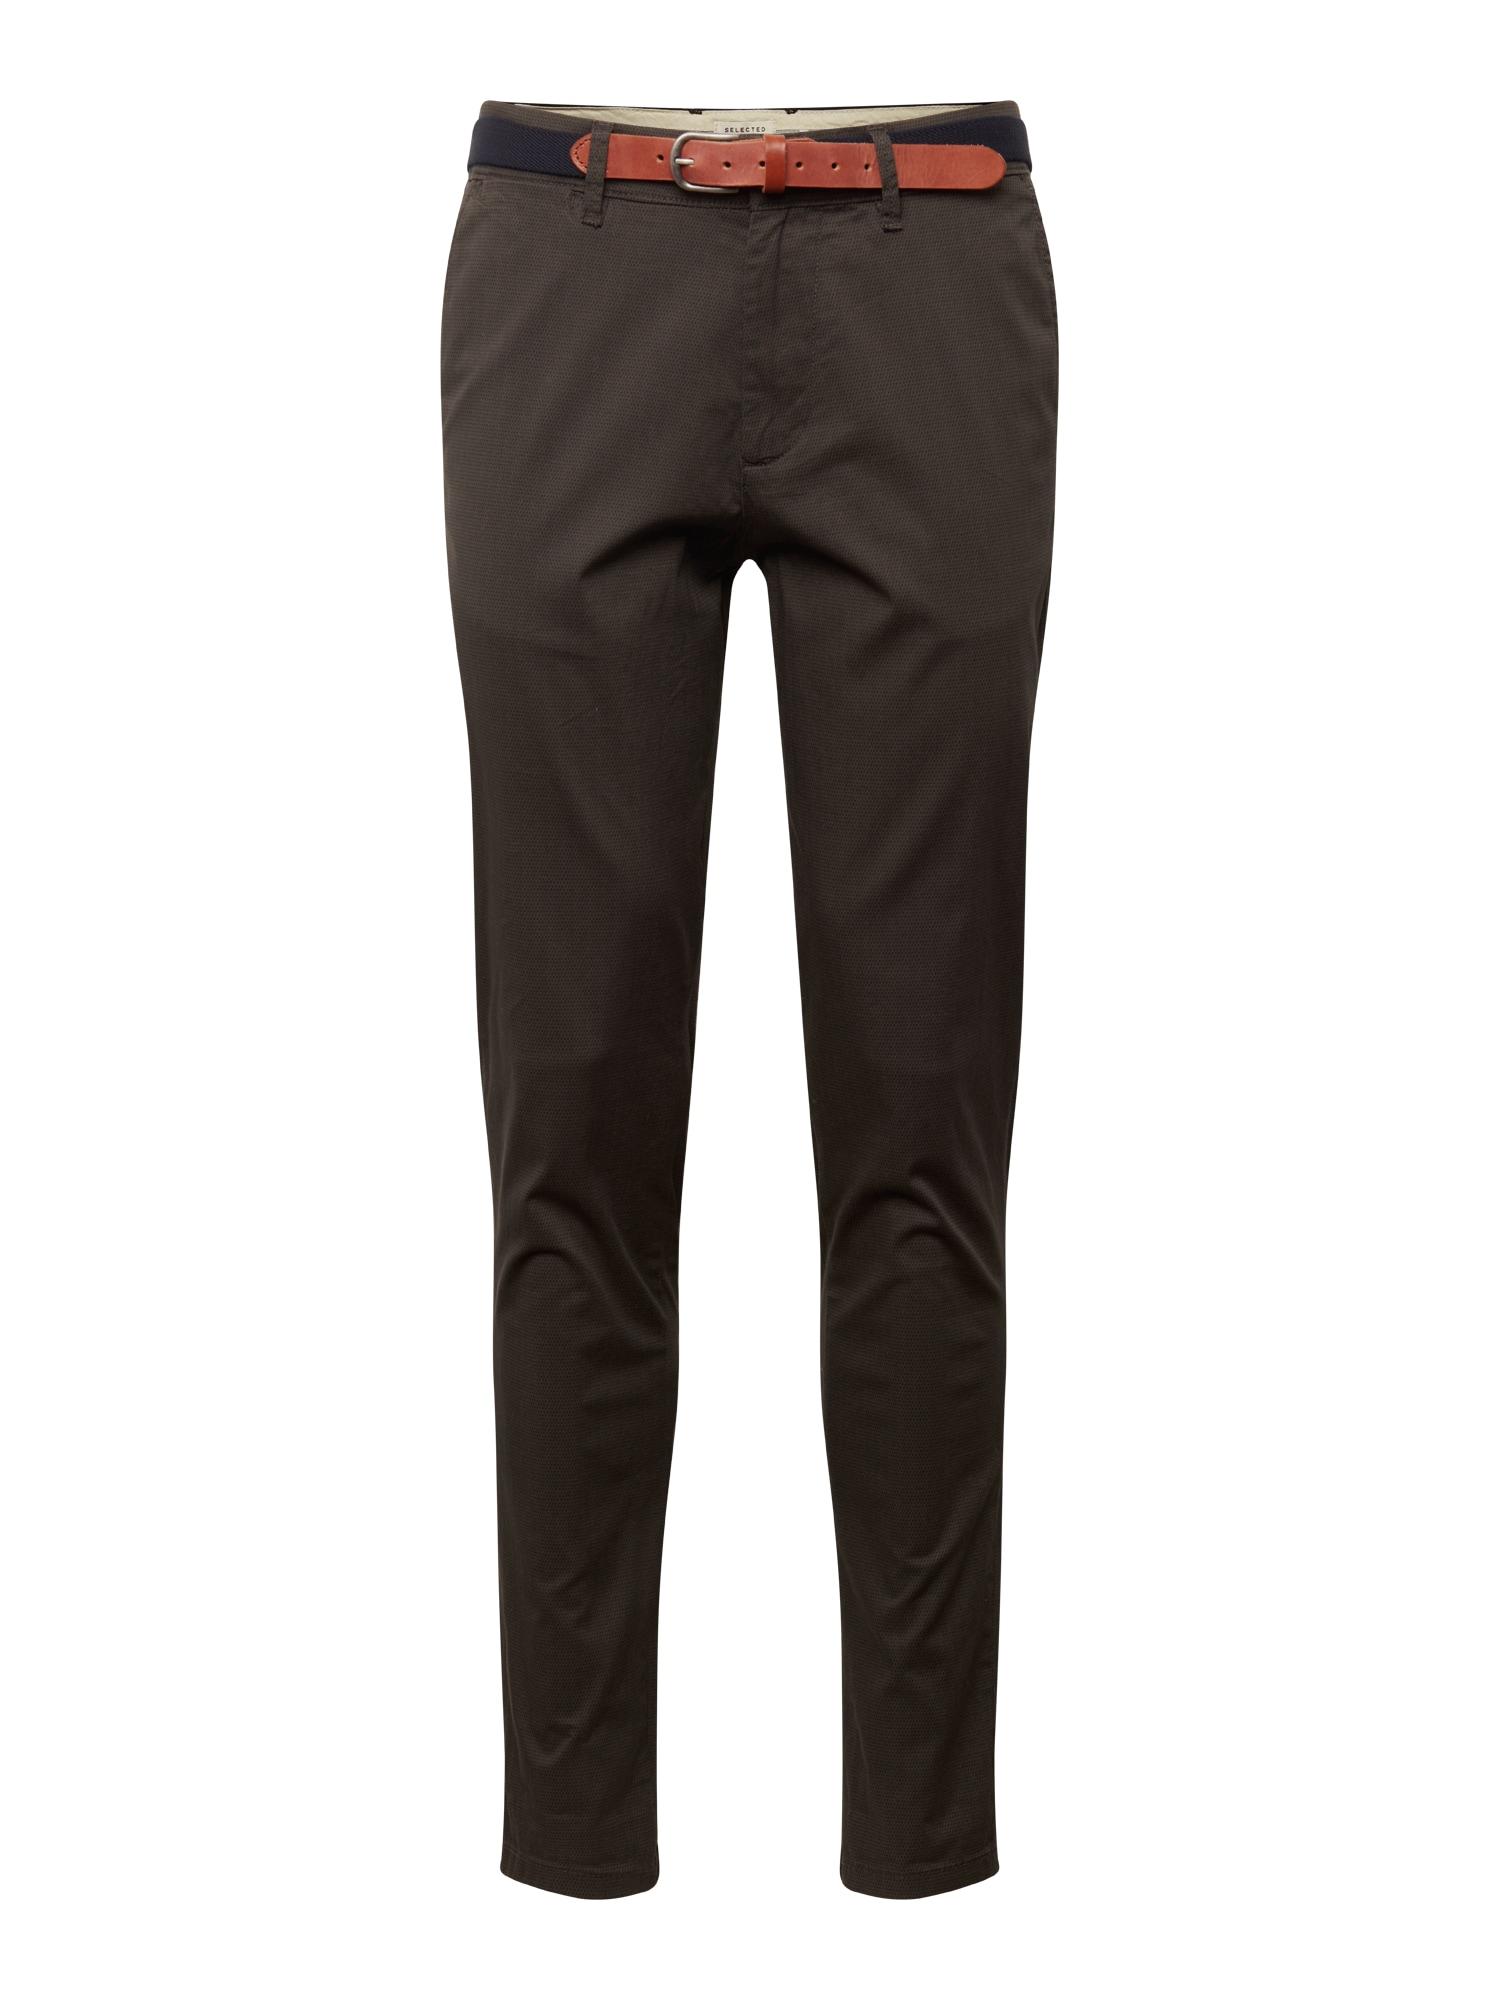 Chino kalhoty LIM-YARD AOP PANTS W tmavě šedá SELECTED HOMME